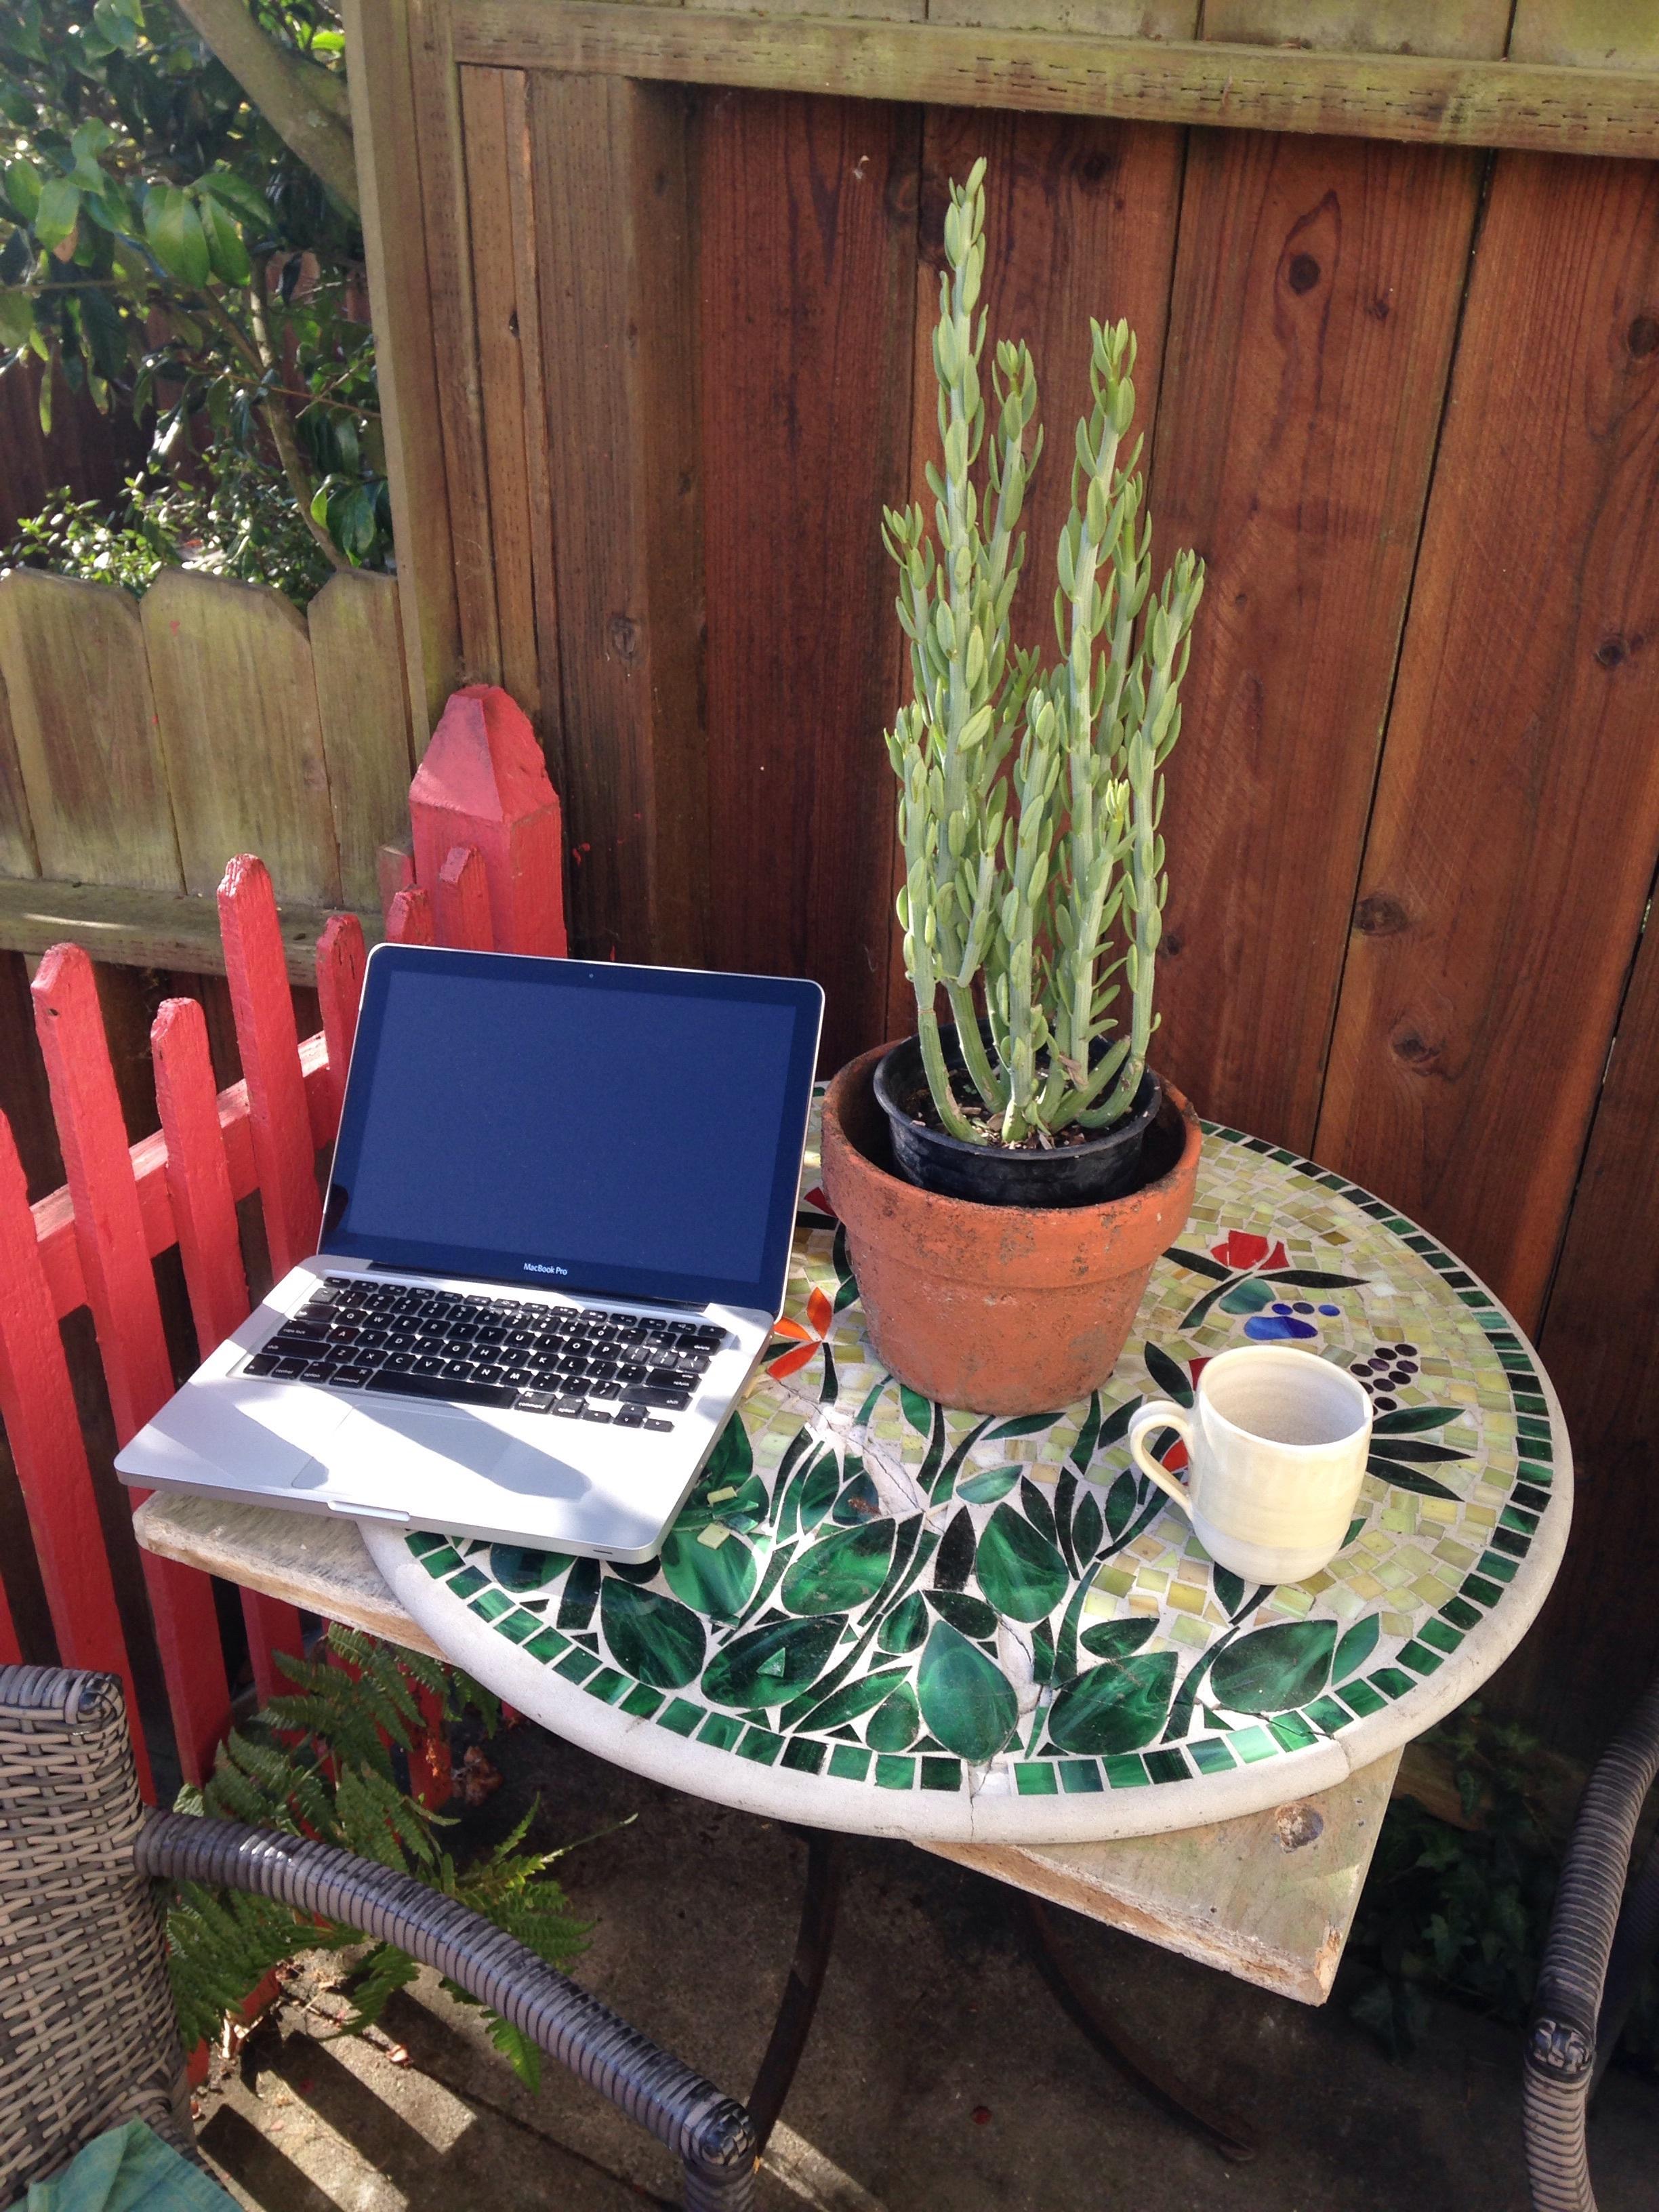 Backyard, author's home, Richmond neighborhood, San Francisco, Ca. 8:30 a.m. August 31, 2017.